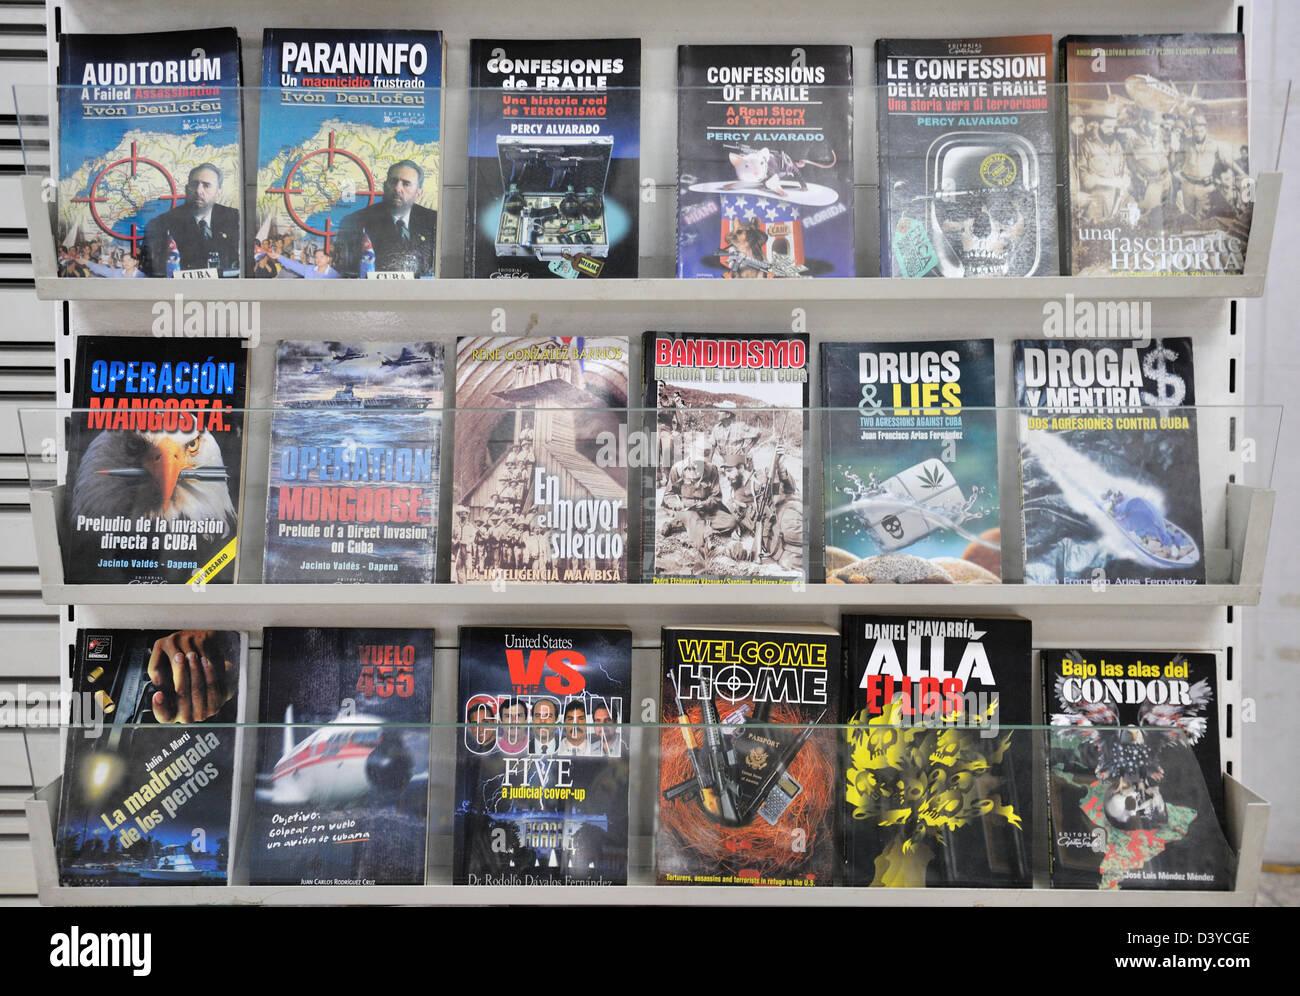 Market stand with propaganda materials, Havana, Cuba - Stock Image